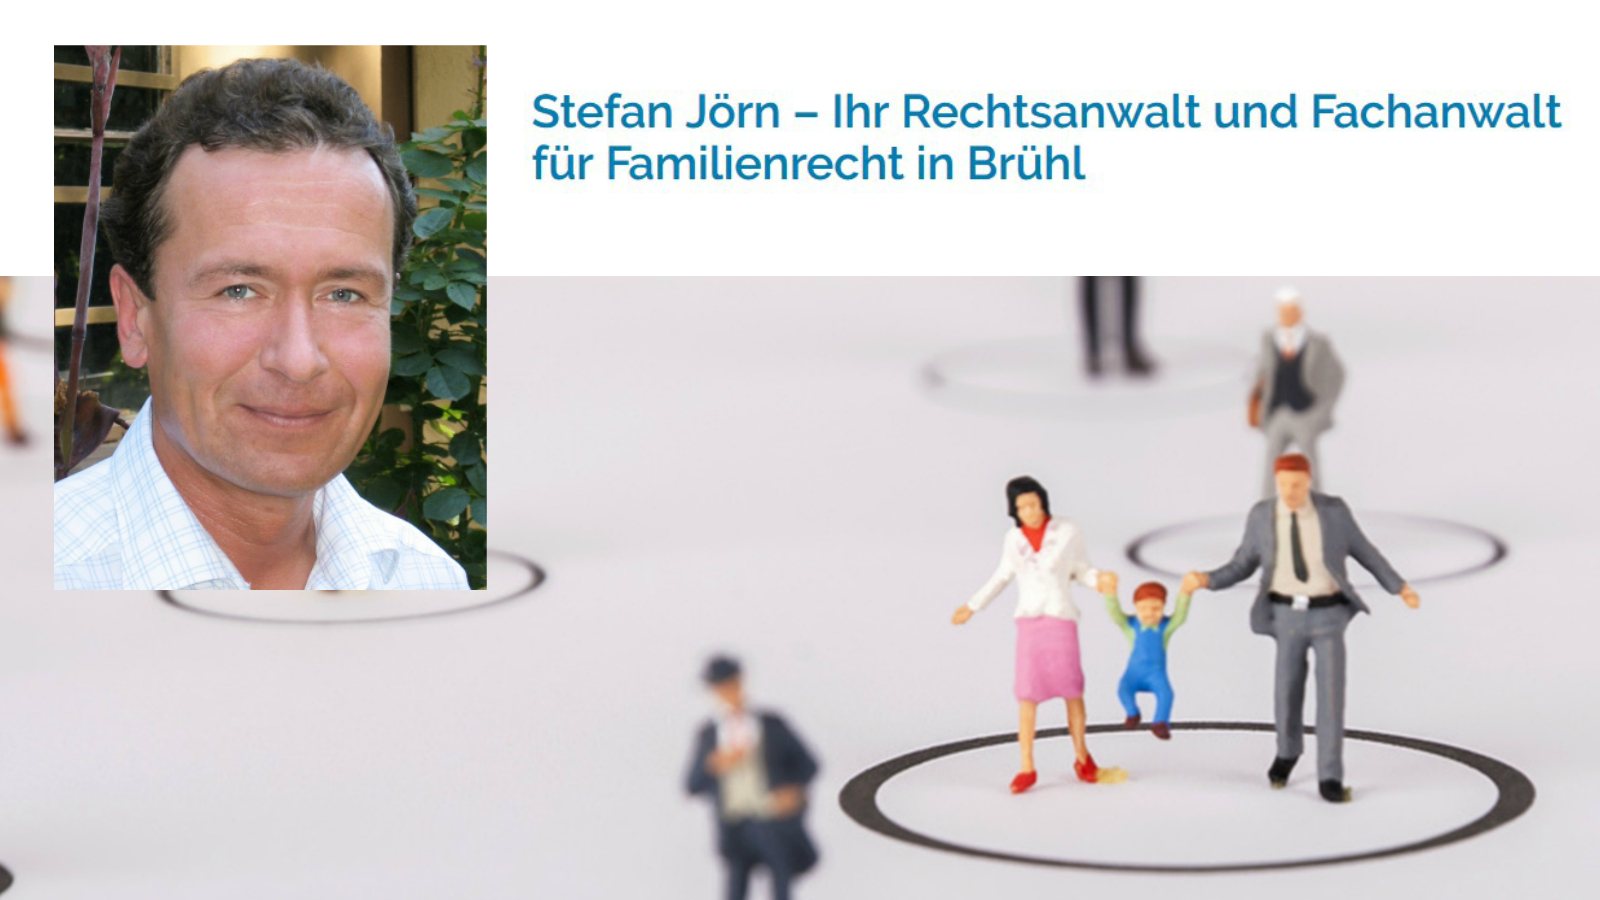 Rechtsanwalt Stefan Jörn